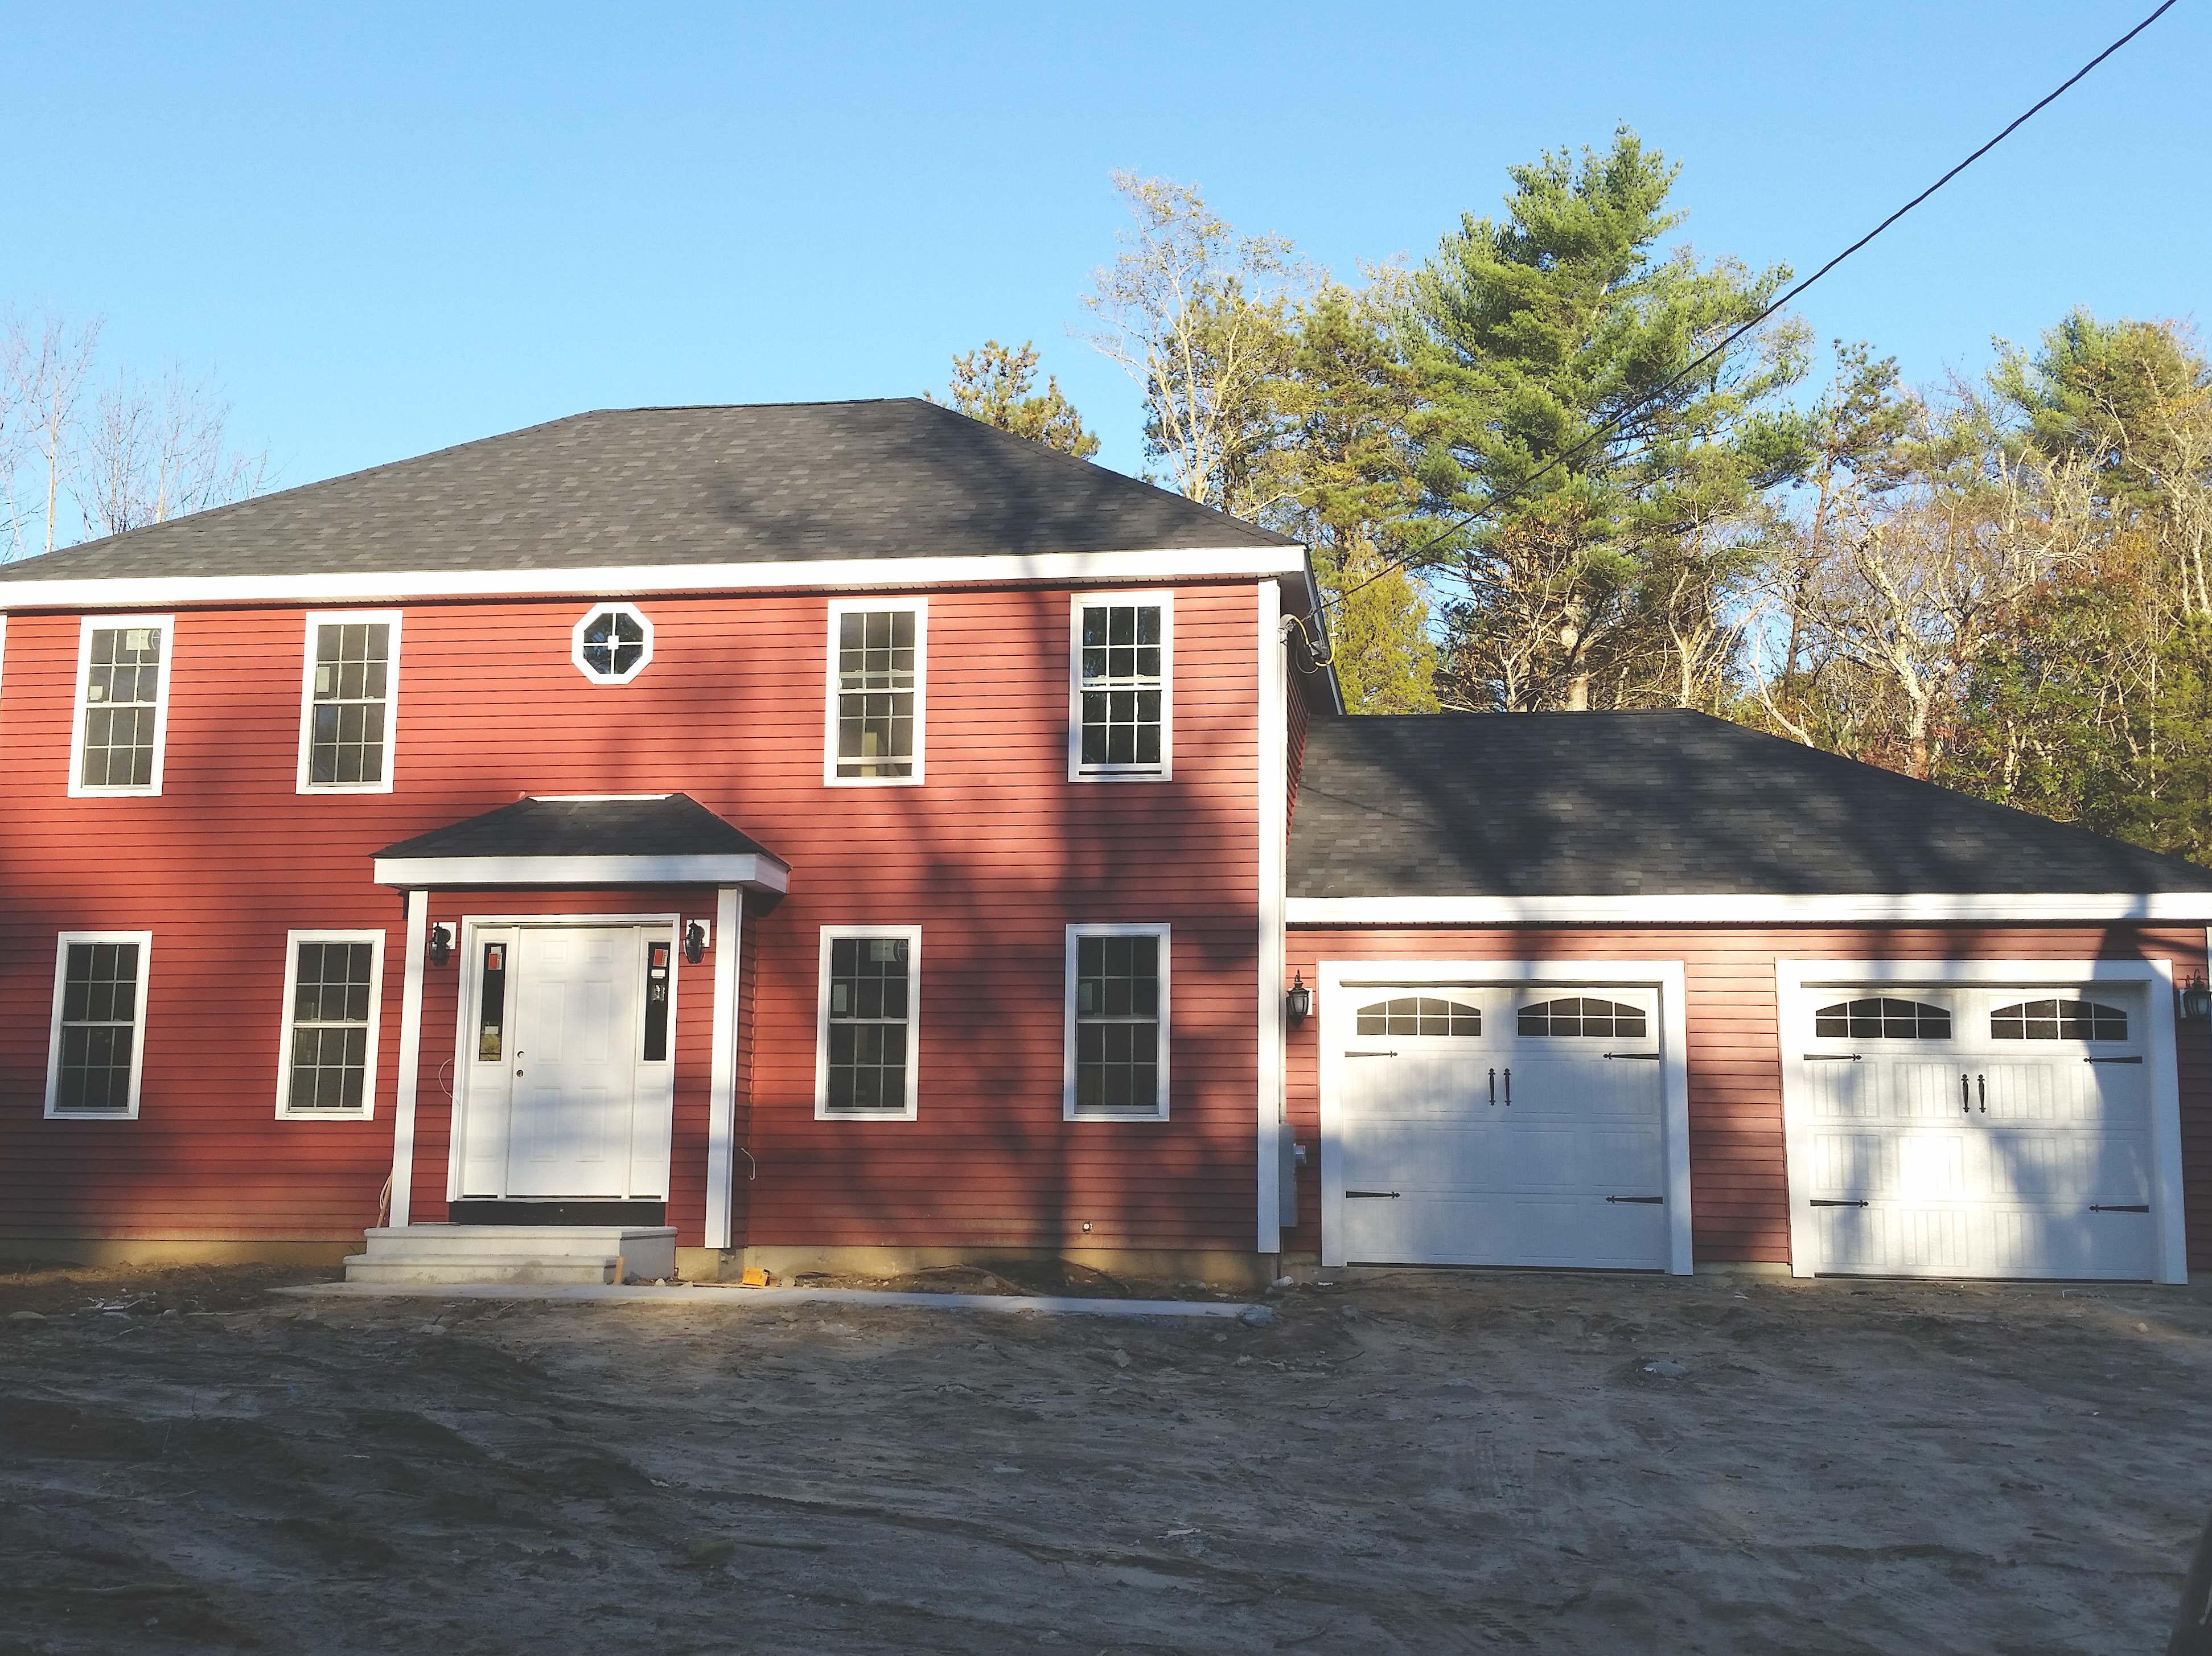 Lot 1 Linbi's Path, Carver, Massachusetts 02330